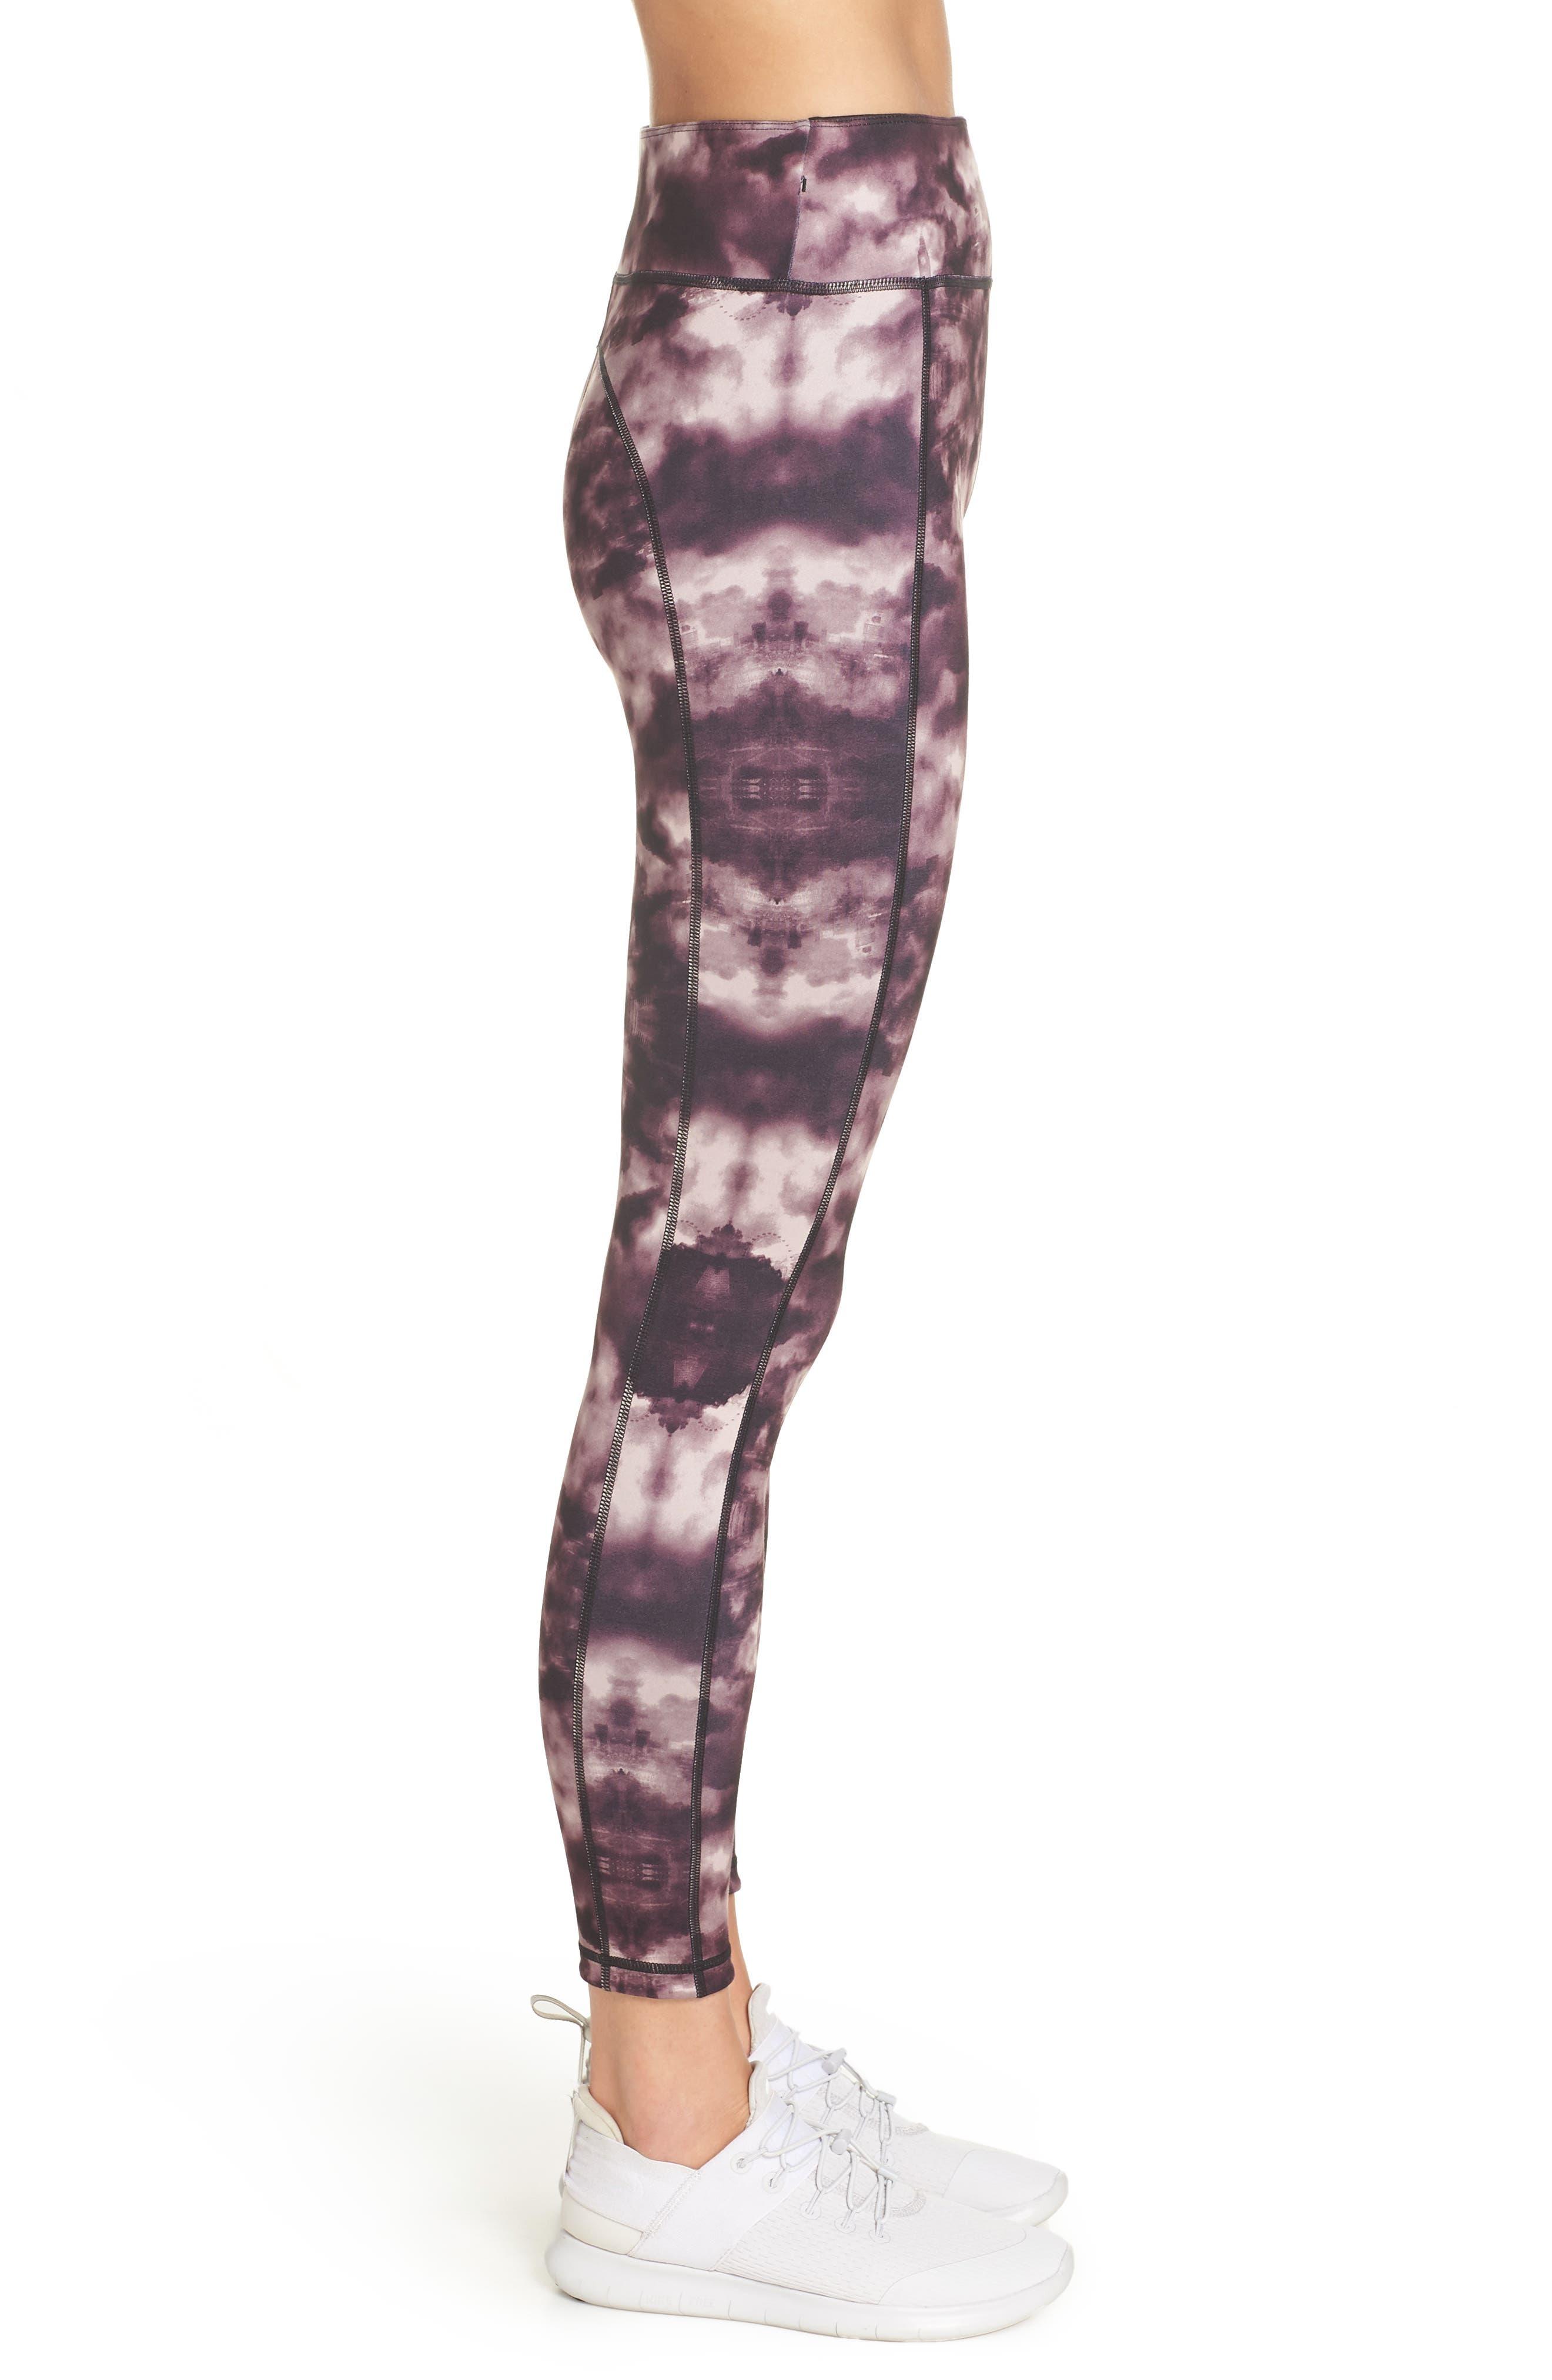 Double Duty Reversible Yoga Leggings,                             Alternate thumbnail 3, color,                             AUBERGINE LONDON PRINT